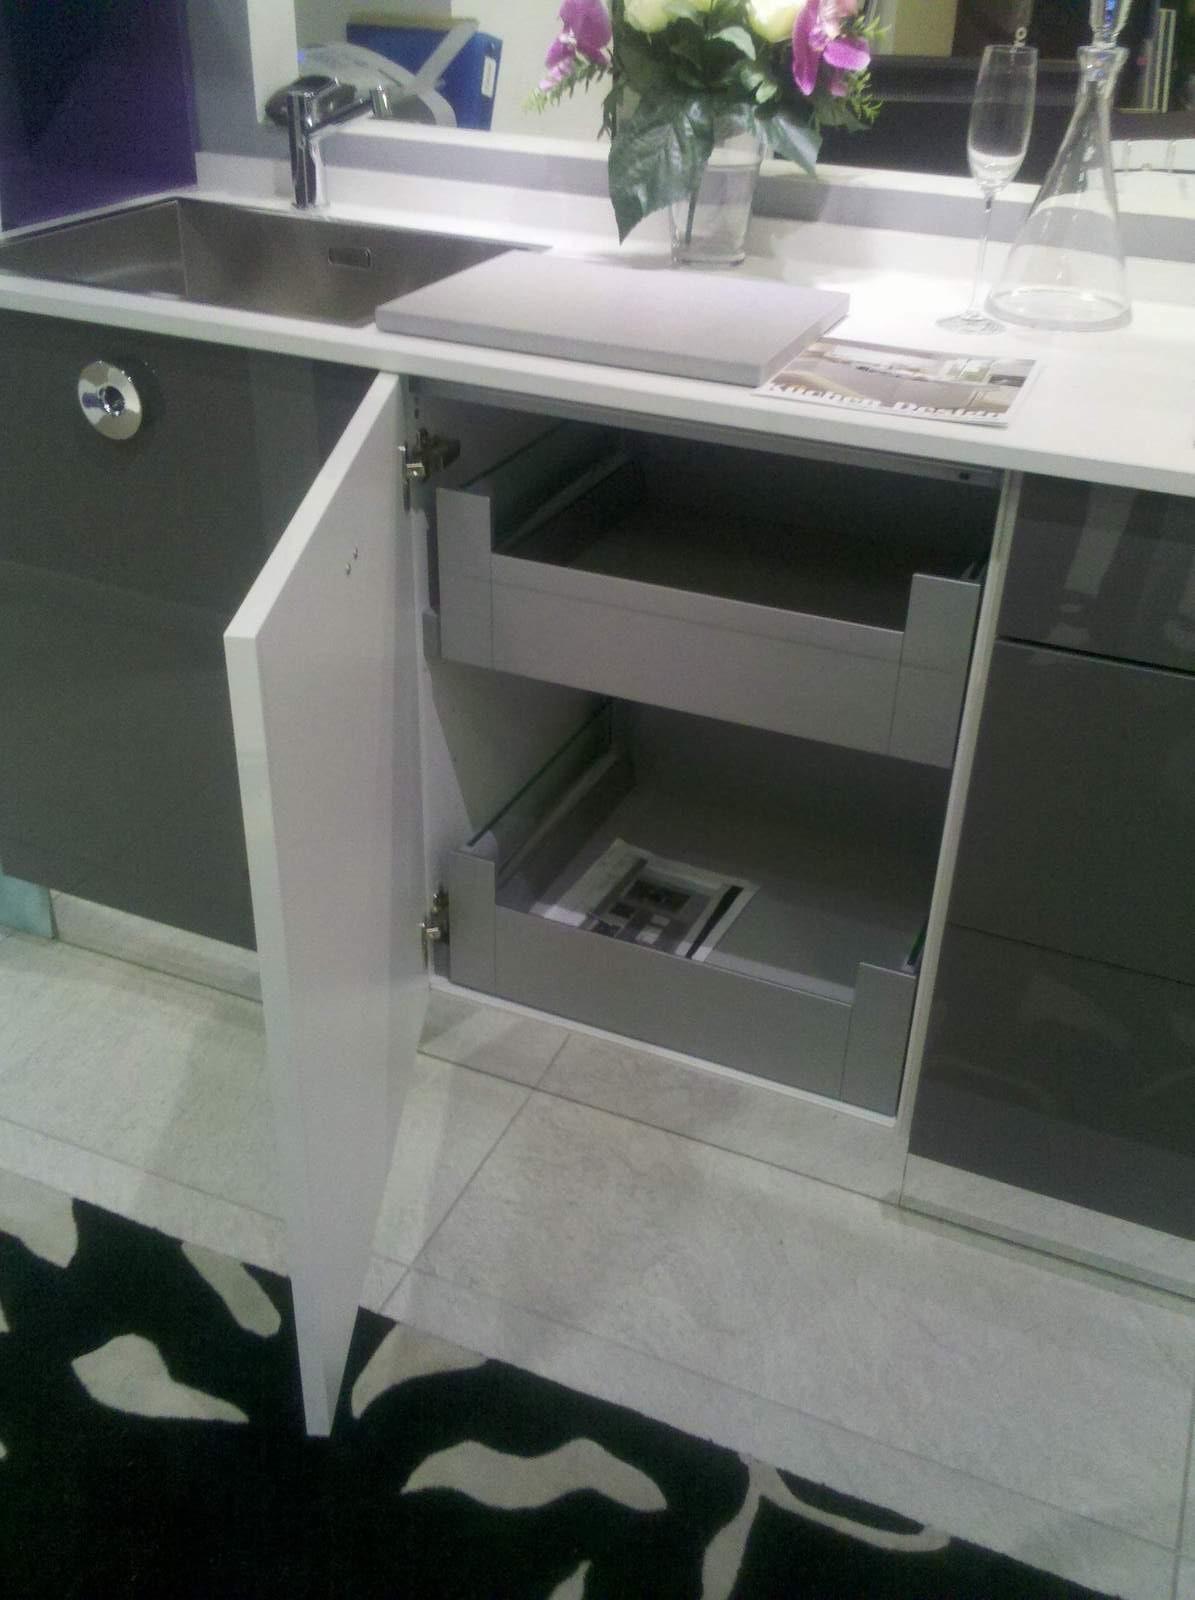 Kuchen design roma cucina lux outlet 3 kuchendesign le for Kuchendesign outlet lubeck